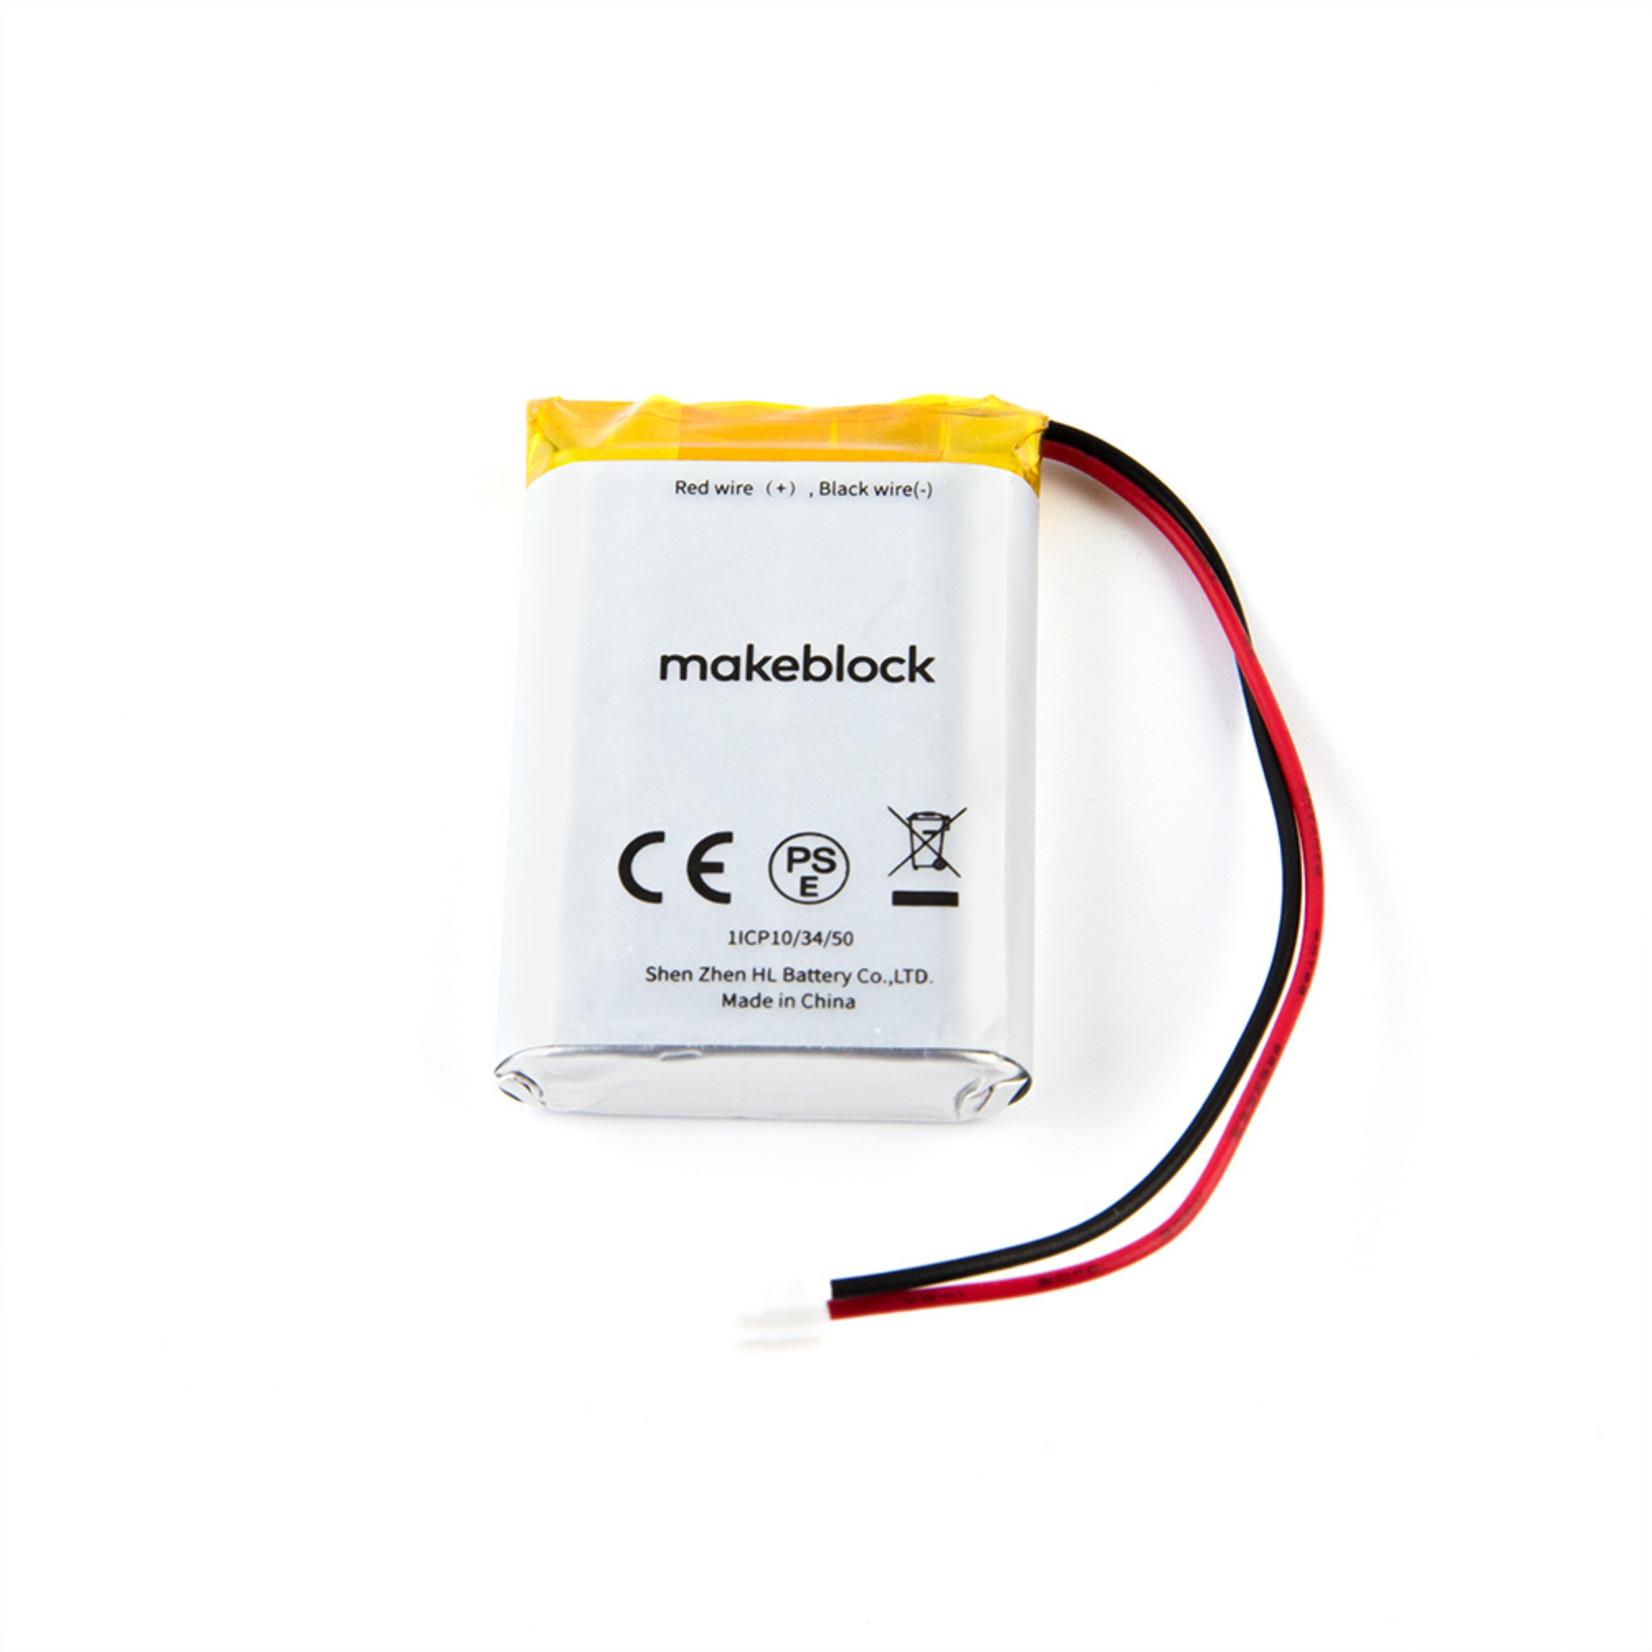 makeblock mBot Li-polymer Battery